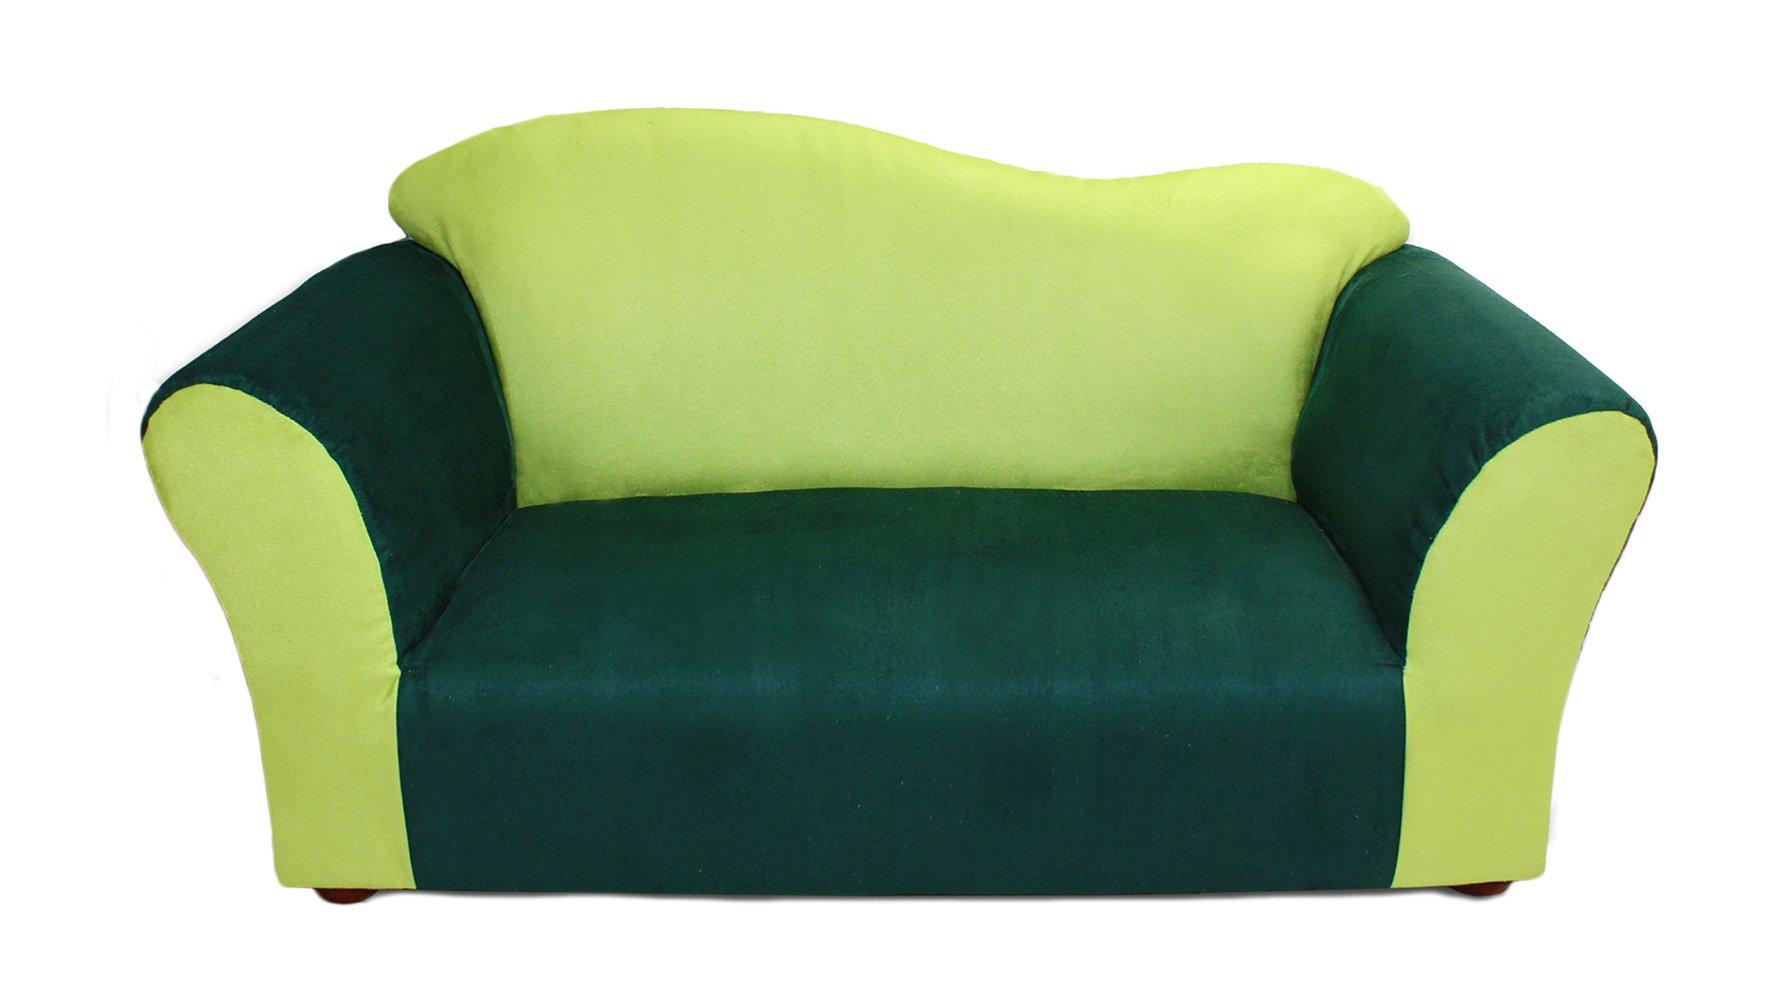 KEET Wave Kid's Sofa, Green by Keet